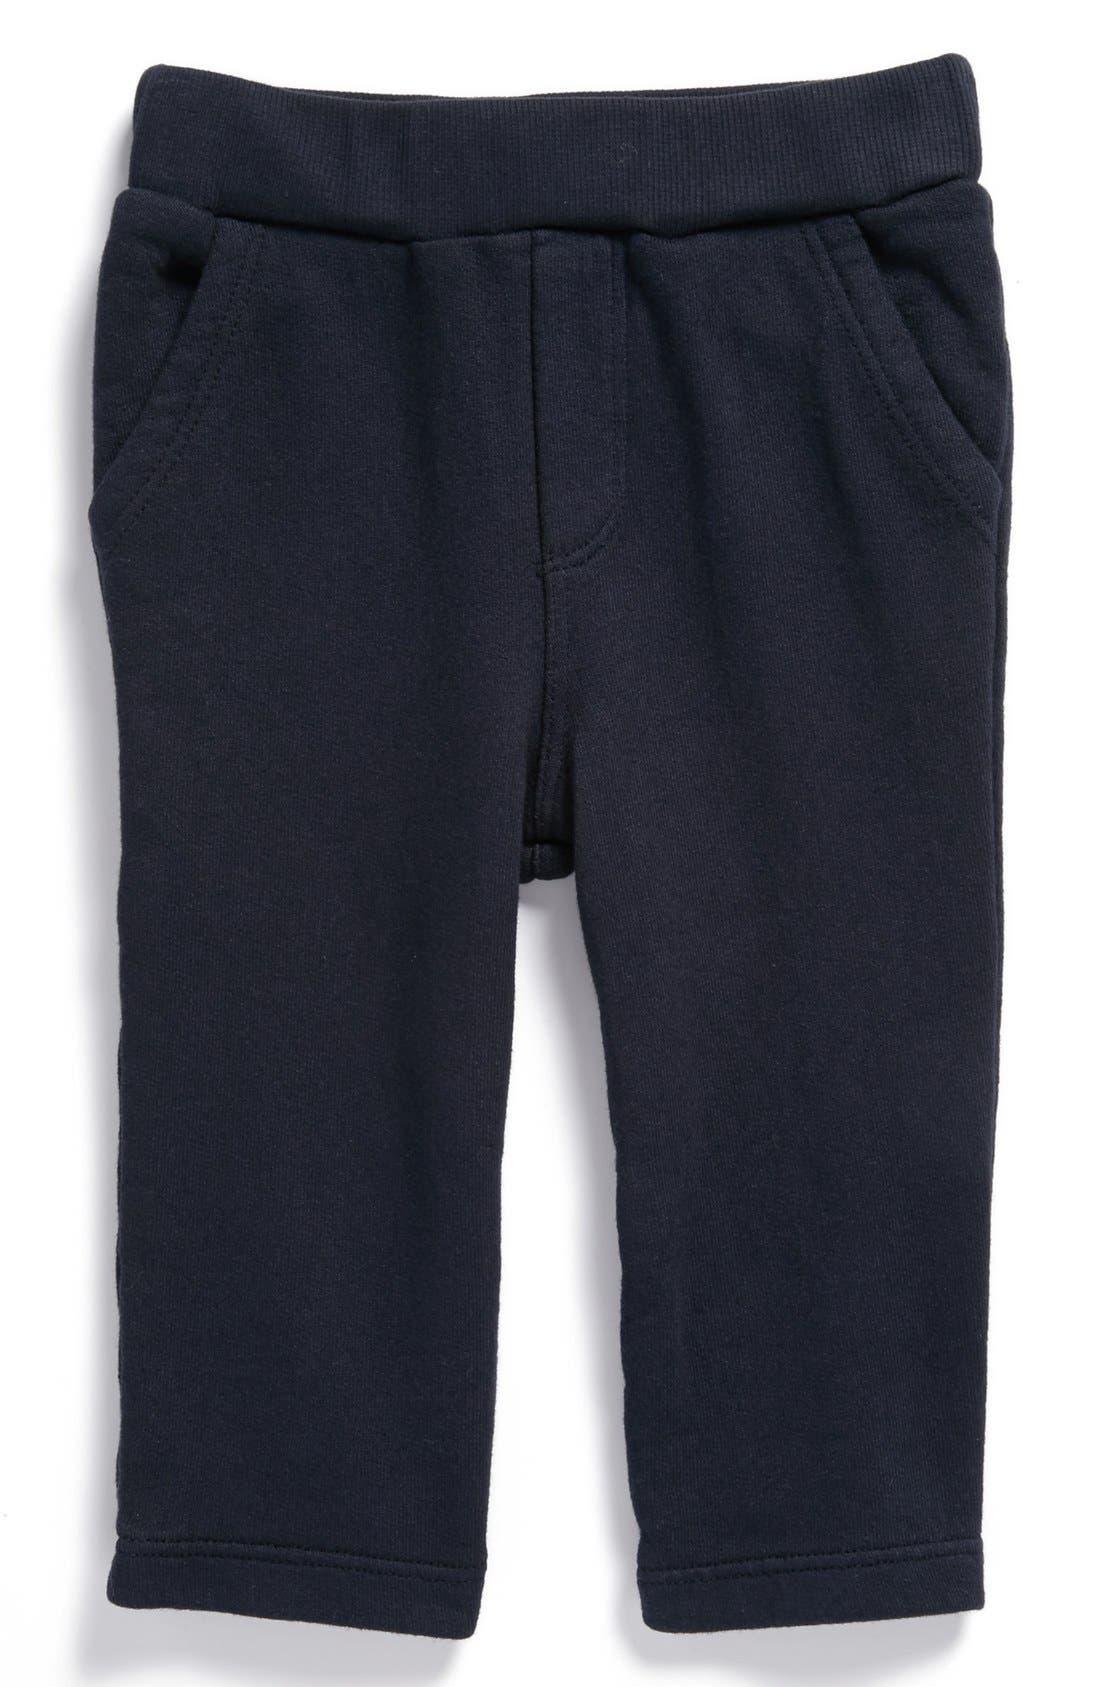 Main Image - Splendid 'Off Duty' Pants (Baby)